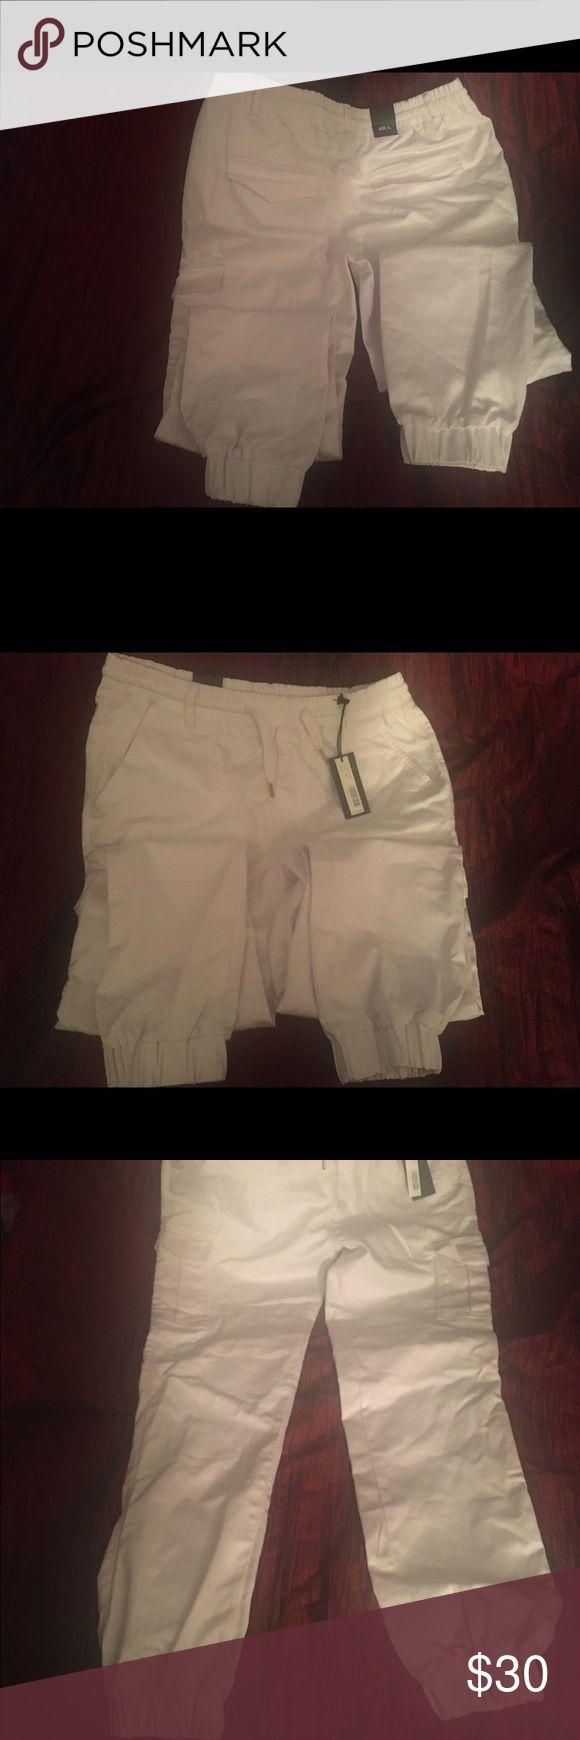 White Jogger Jeans Riflessi collection Premium edition Jogger Jeans White size XL Jeans Skinny